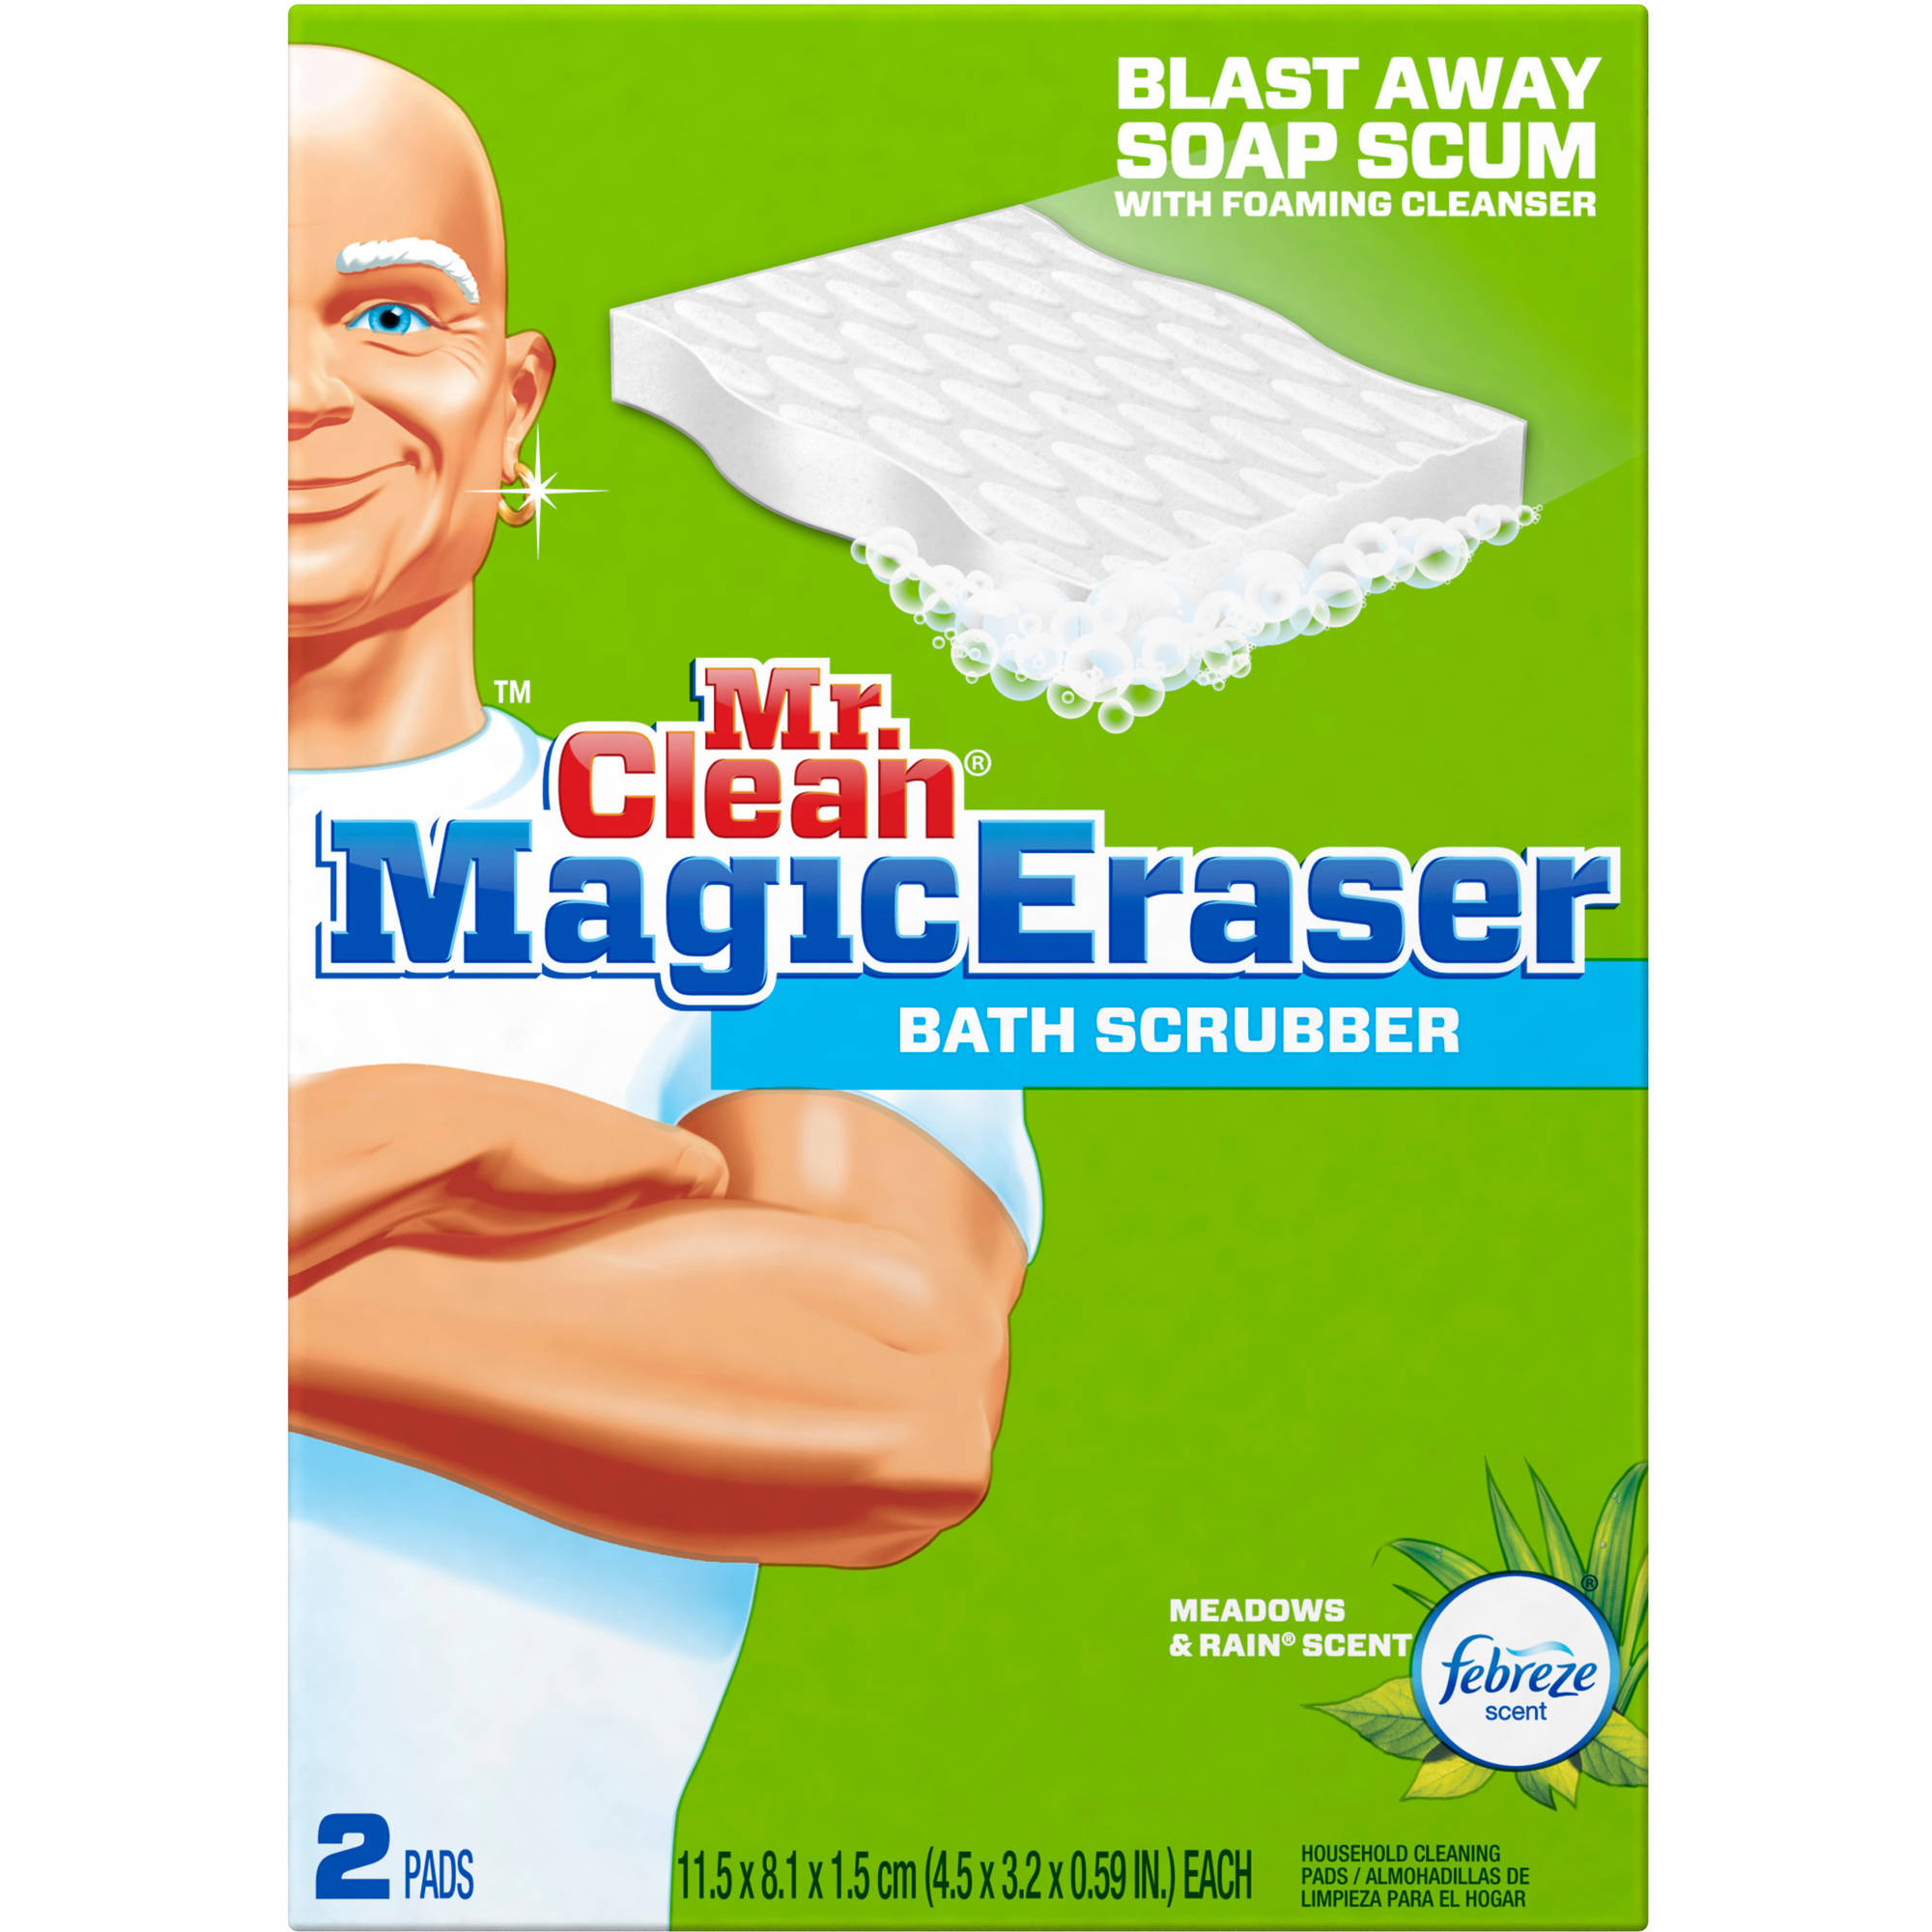 Mr. Clean Magic Eraser Bath Scrubber Febreze Meadows & Rain Scent Cleaning Pads, 2 count